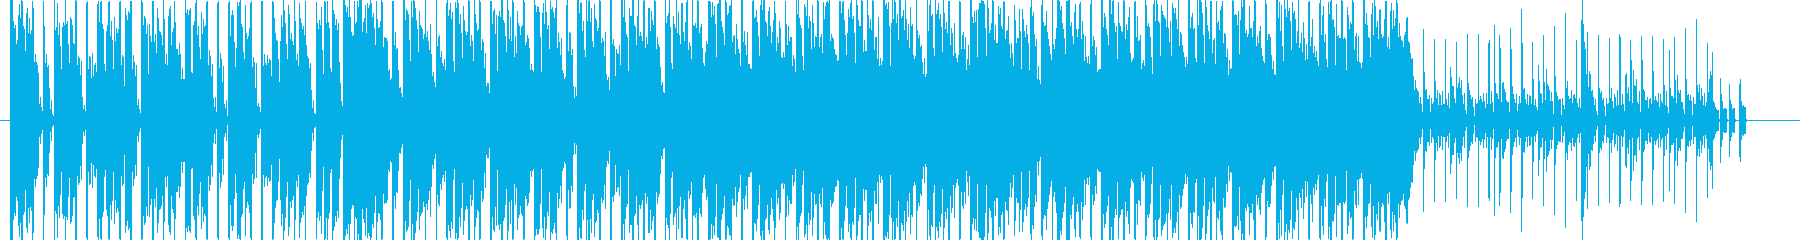 Vlog動画っぽい、爽やかで明るい楽曲の再生済みの波形